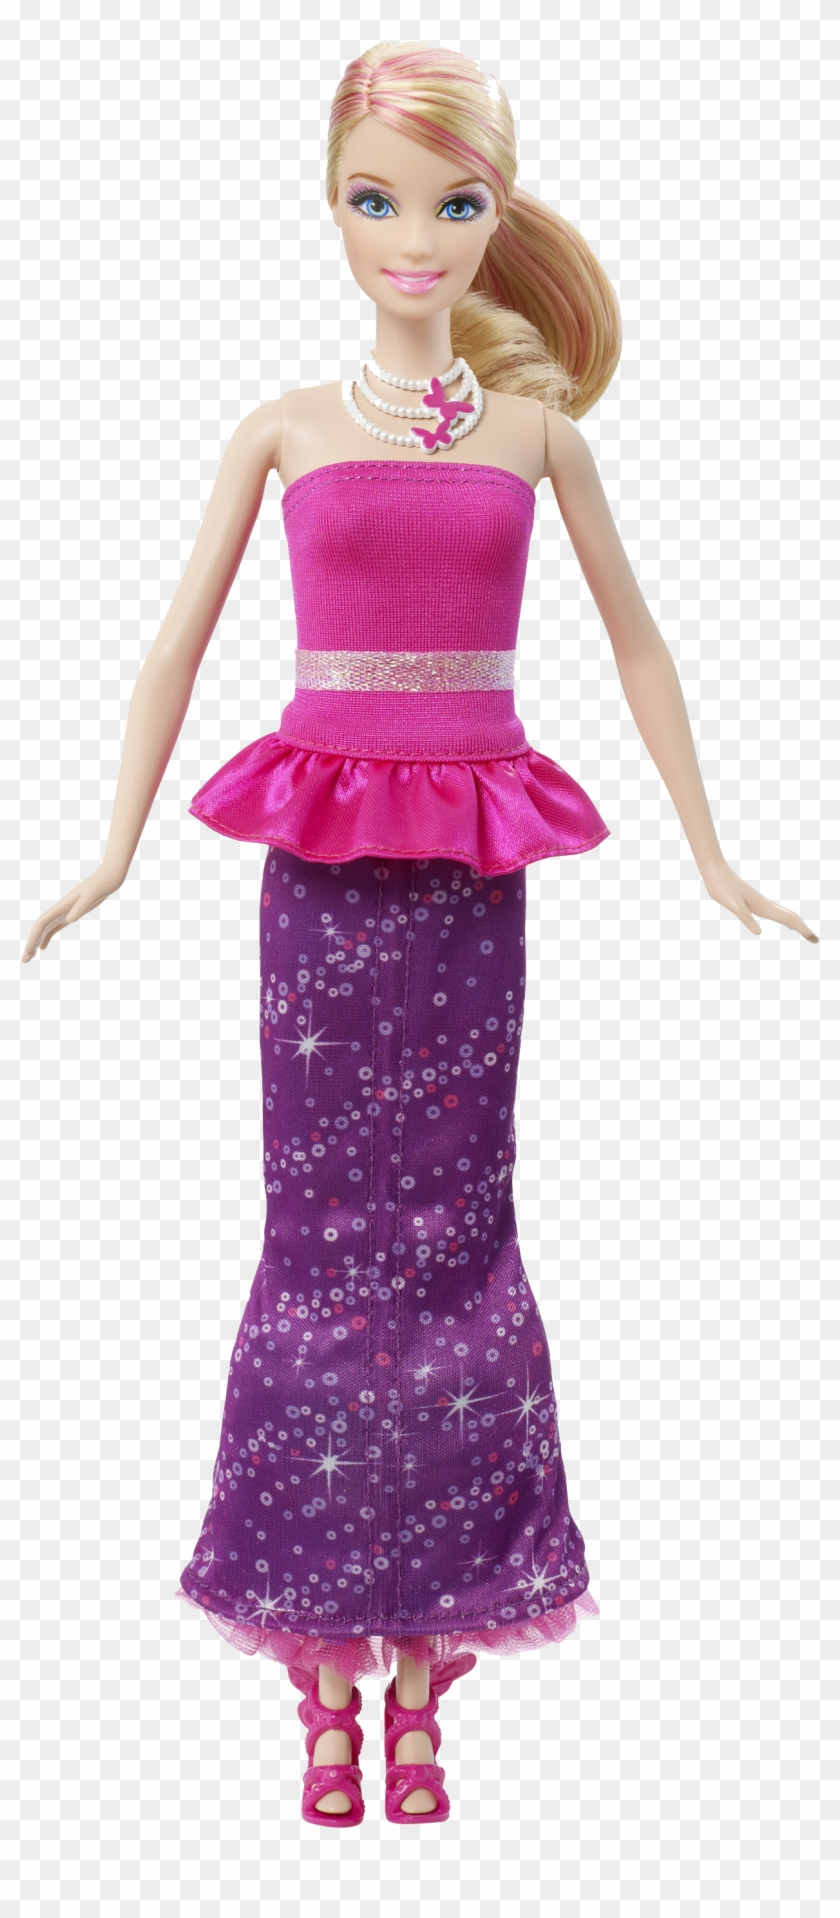 Barbie Doll Free Download Png - Barbie A Fairy Secret Dress, Transparent Png #294298